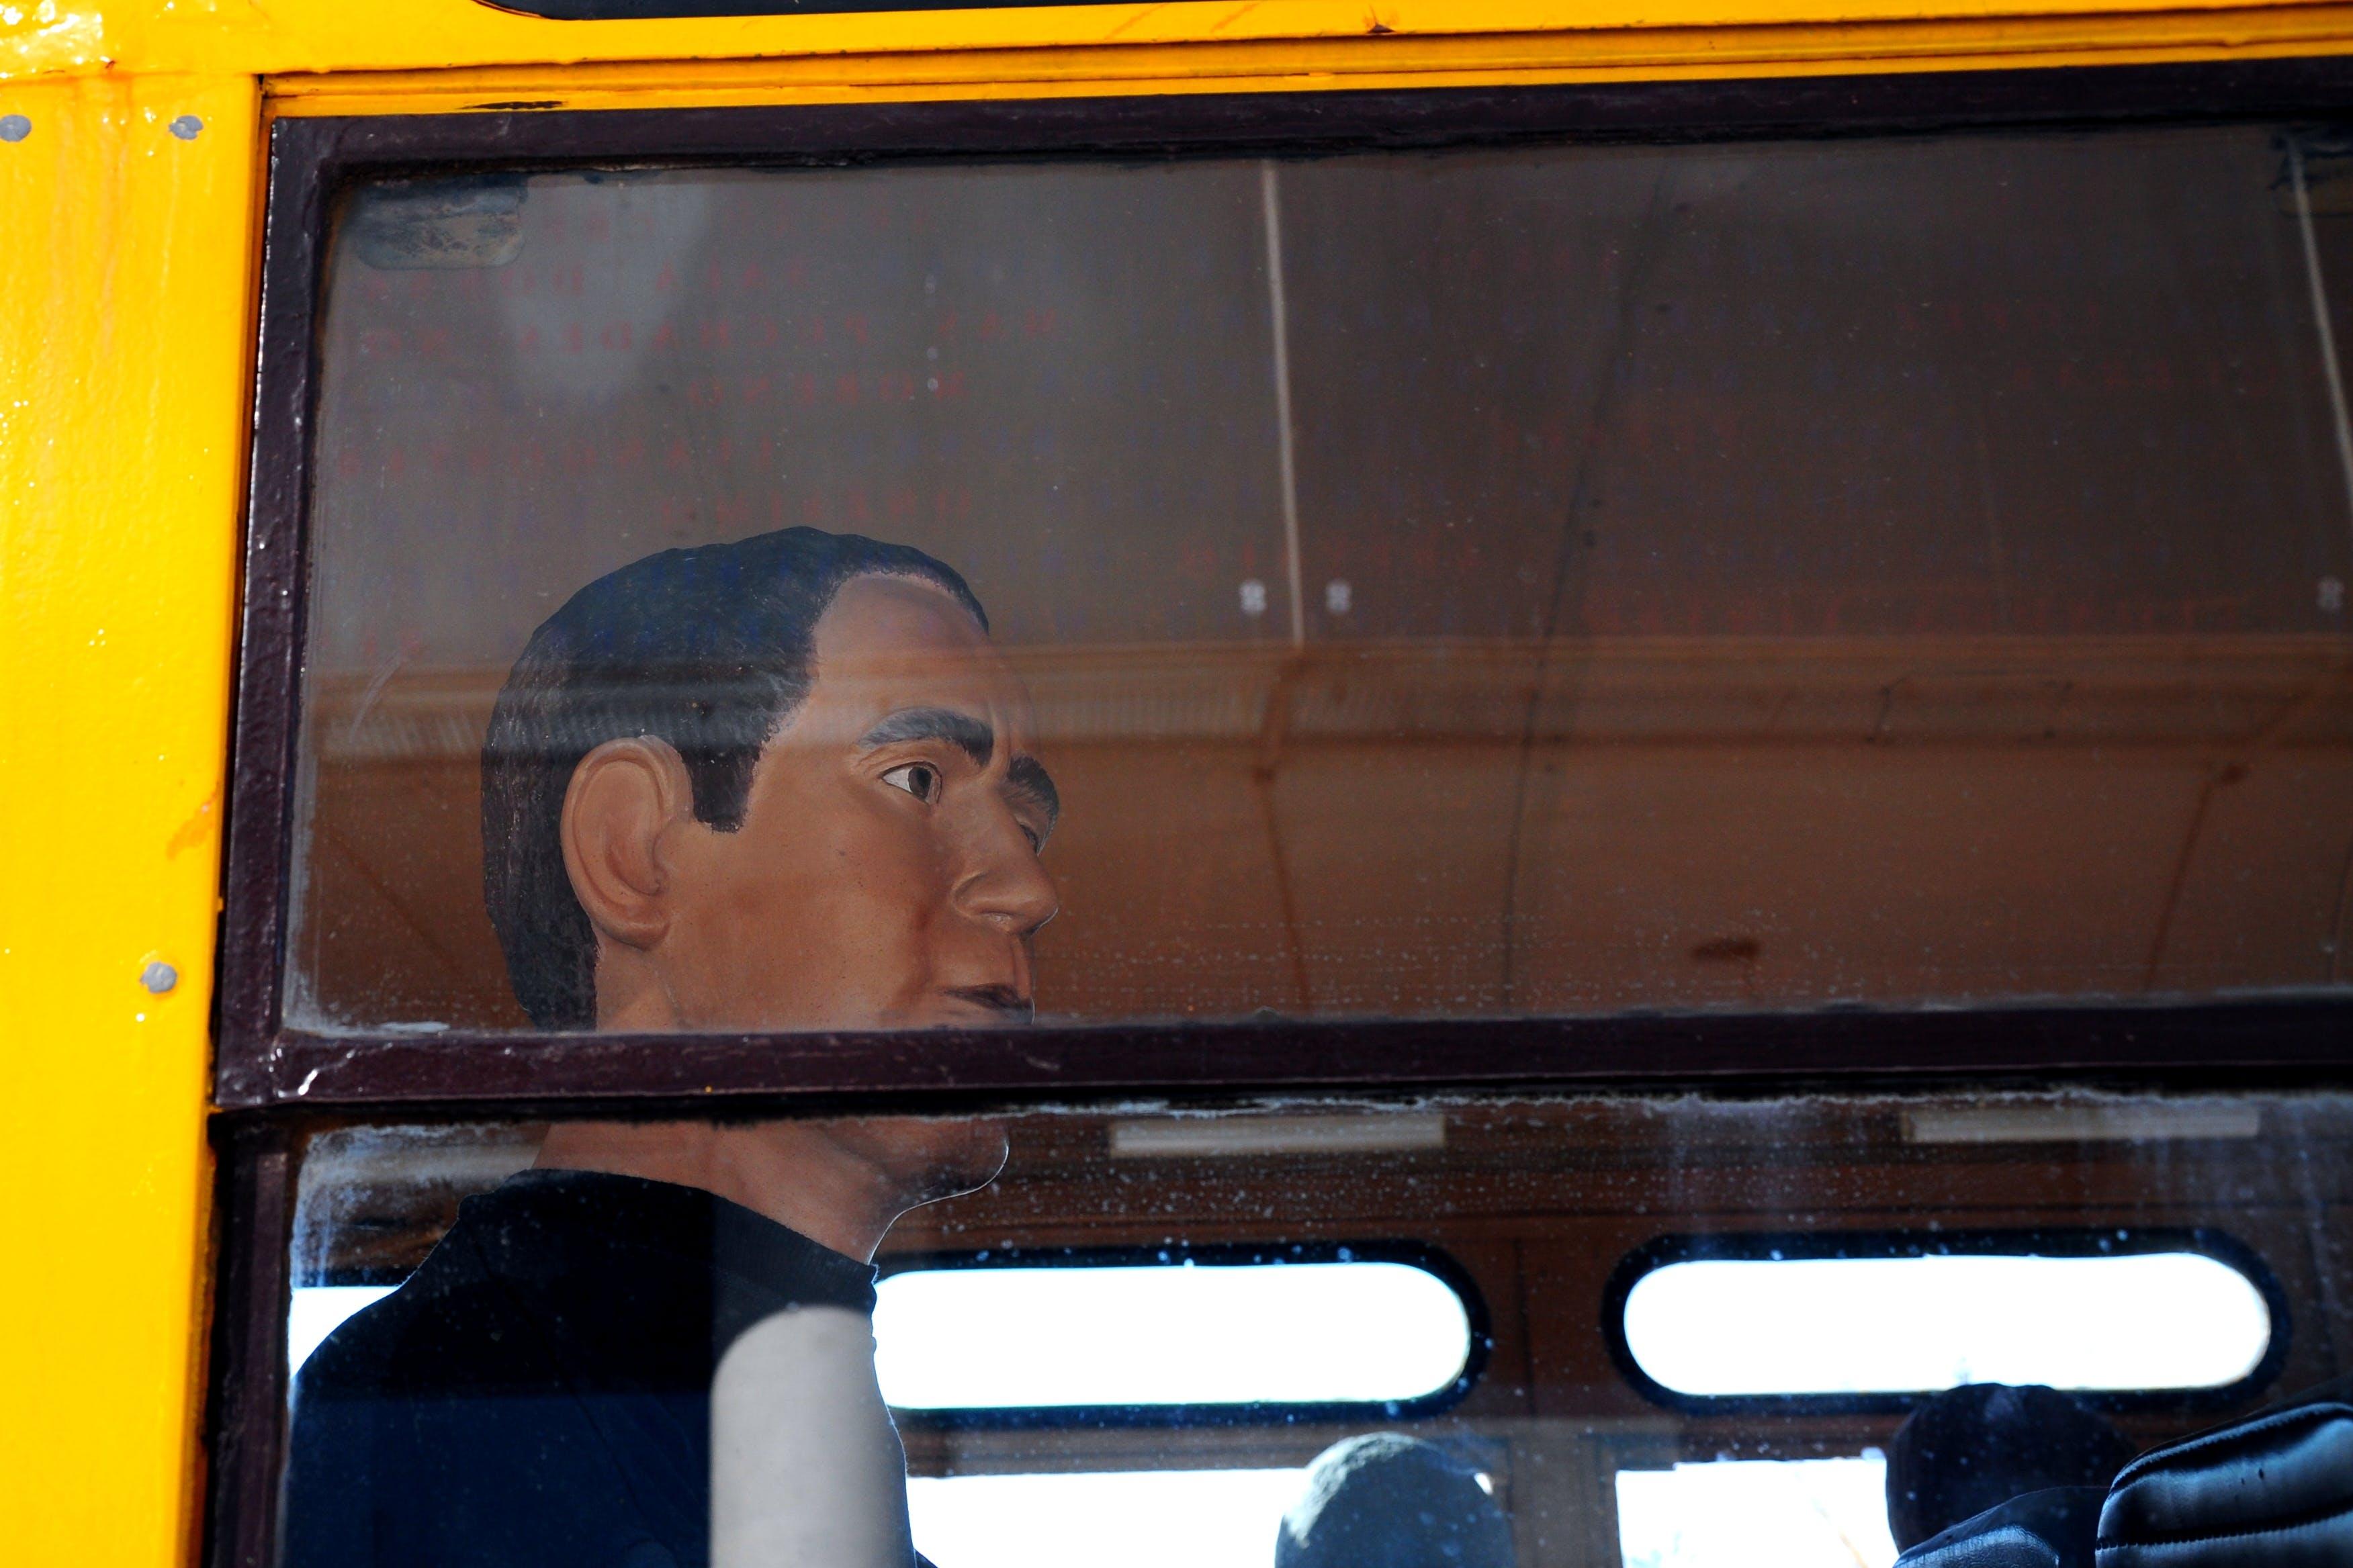 Free stock photo of bus window, mannequin, public transportation, school bus